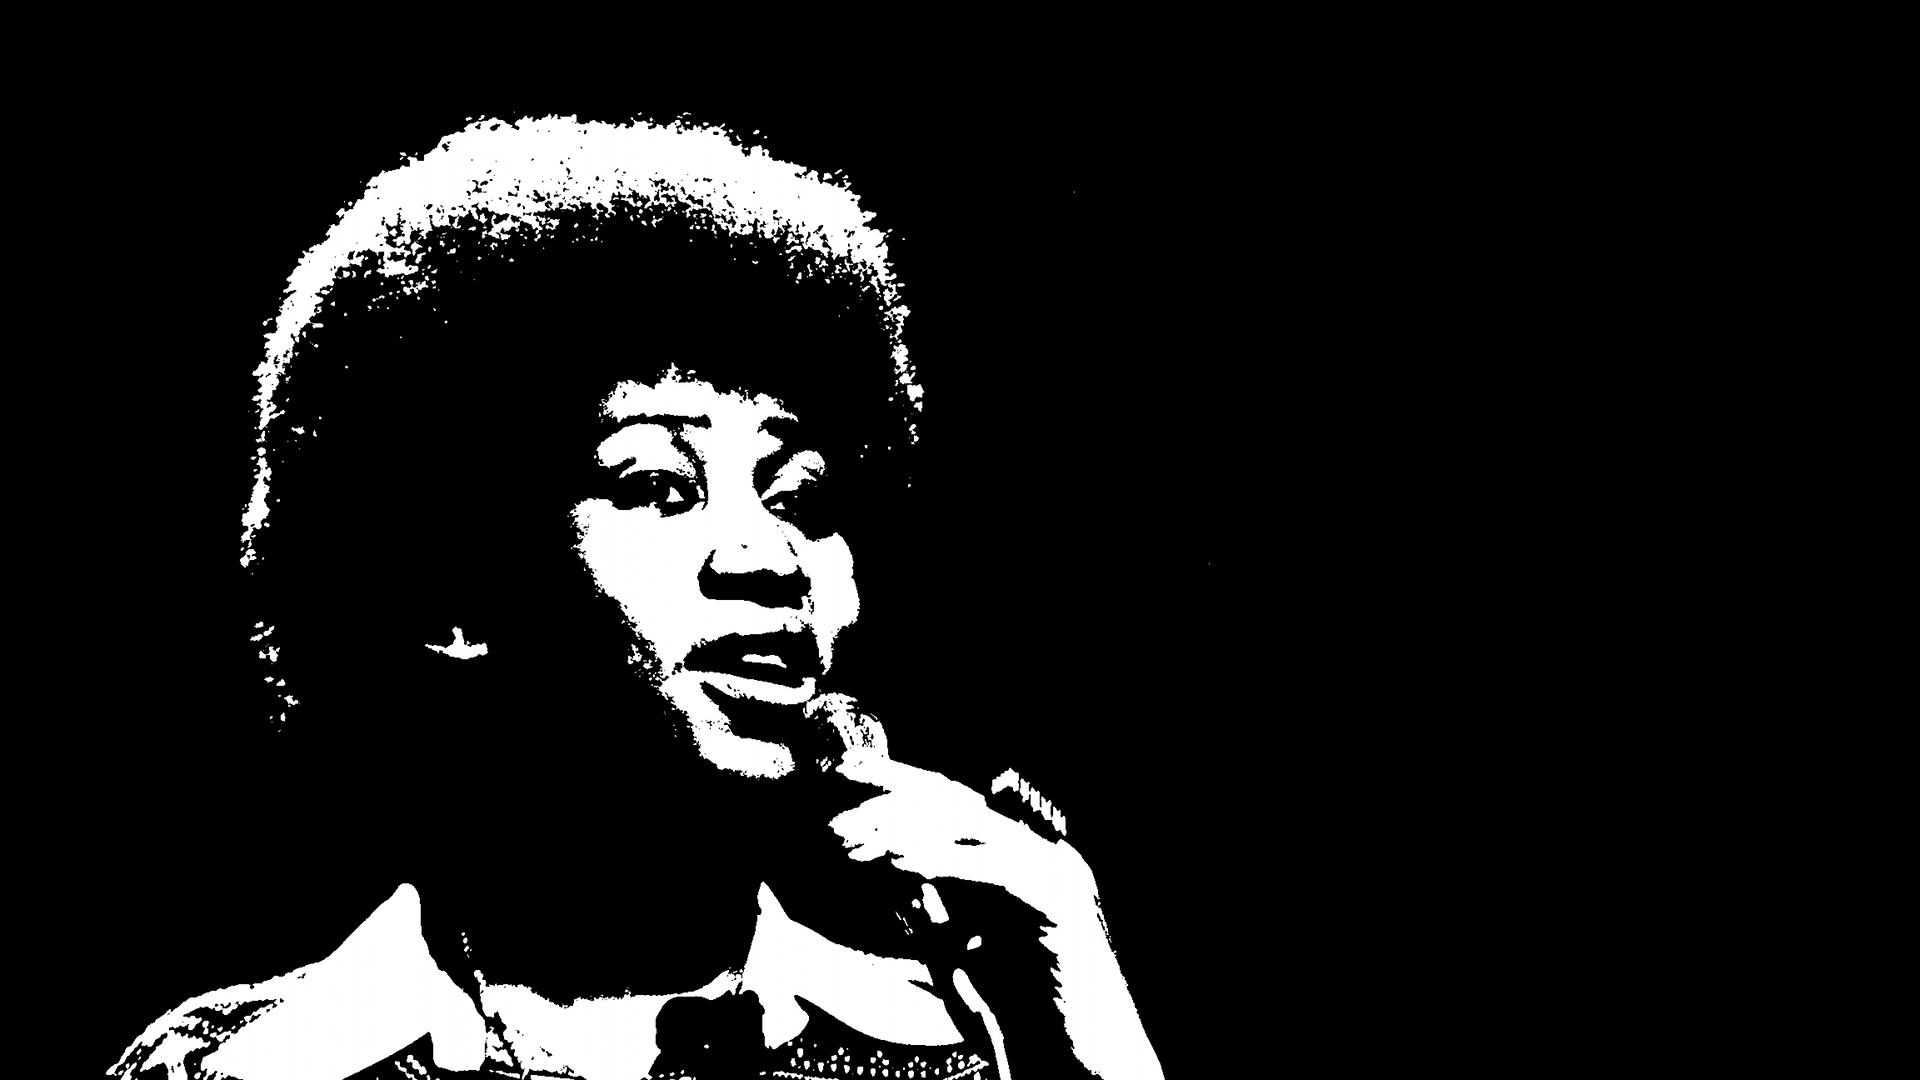 97 Aretha Franklin Wallpapers On Wallpapersafari